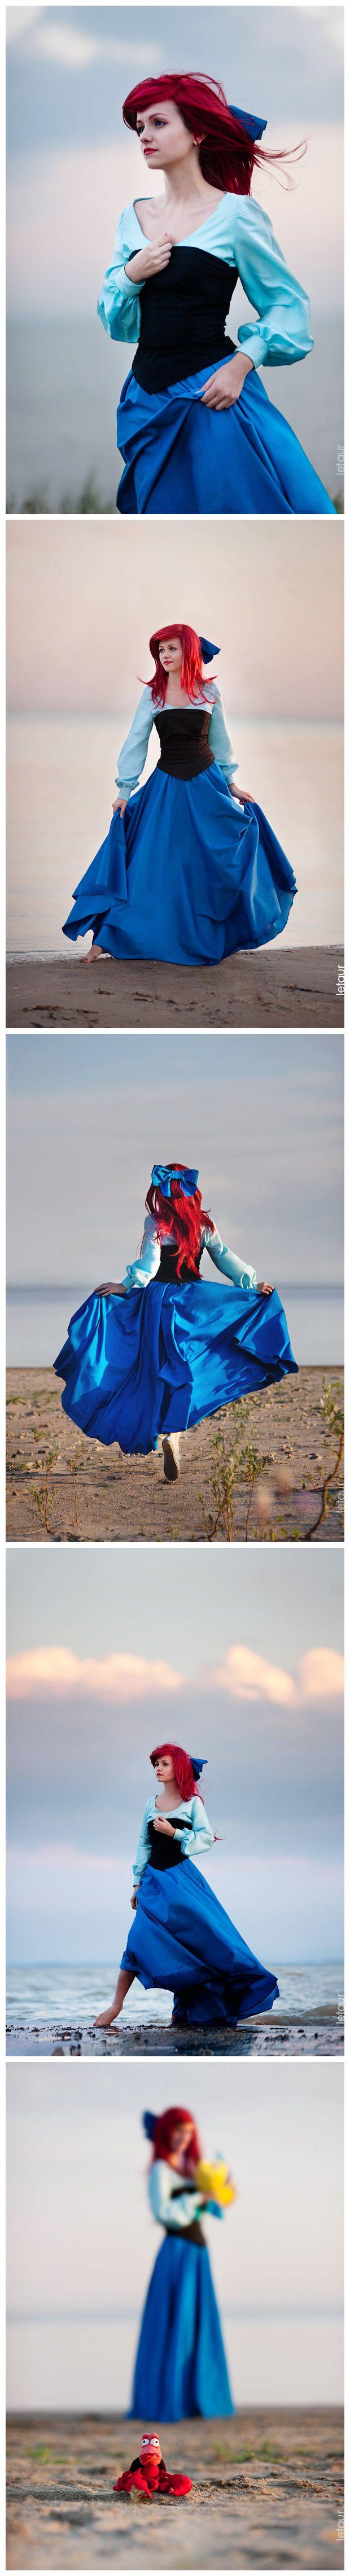 Ariel's town dress, Disney's The Little Mermaid - I love it! Future Halloween costume? :)